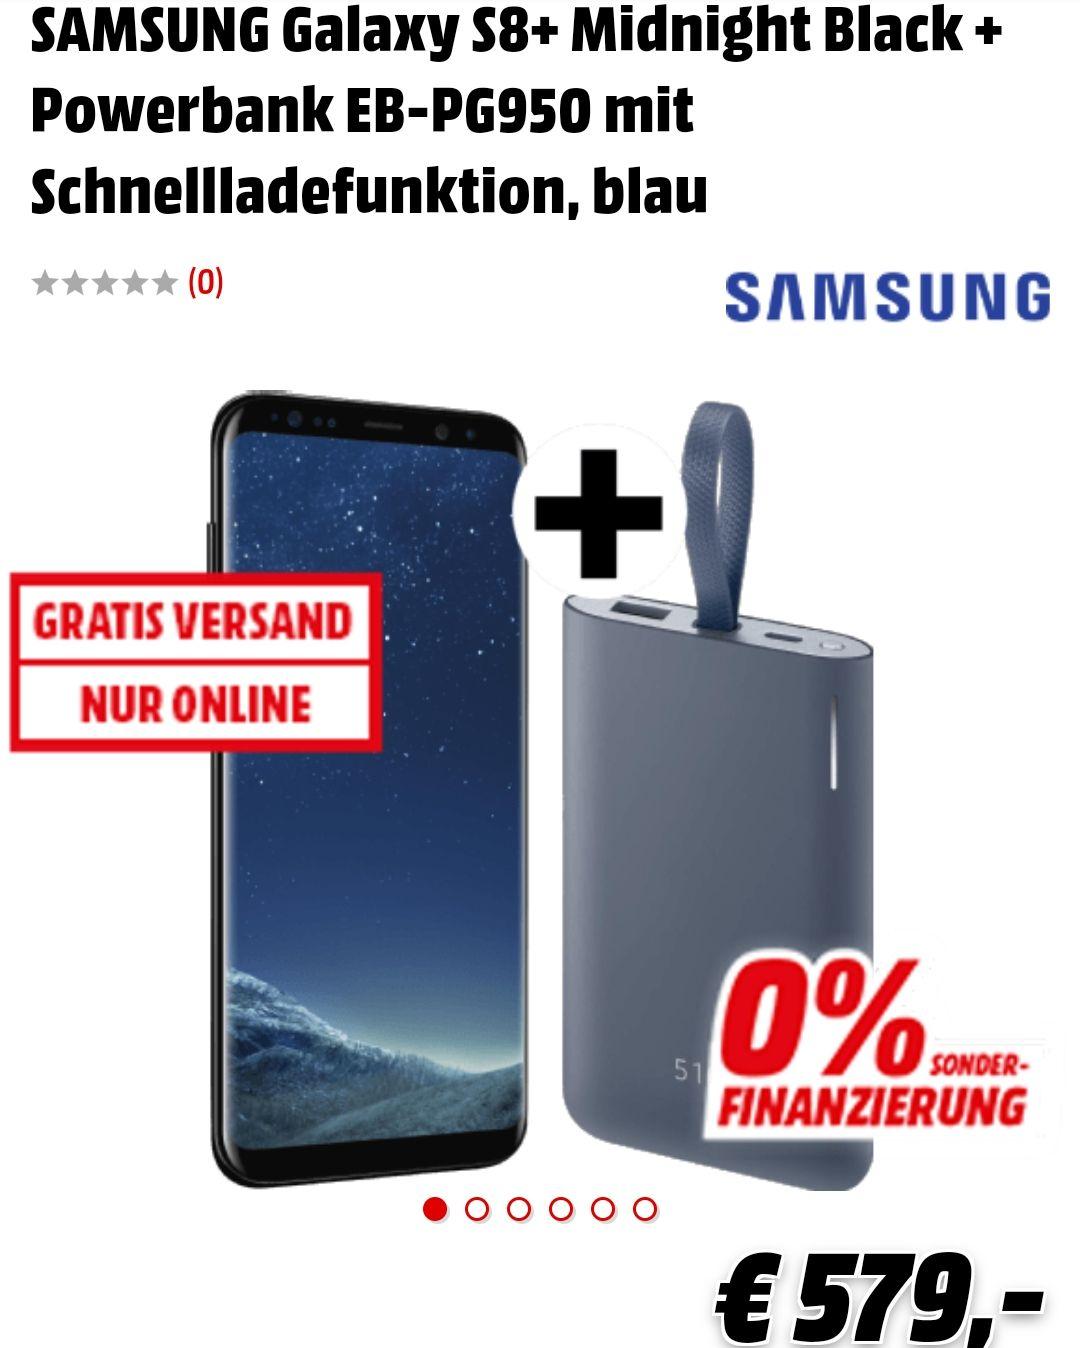 SAMSUNG Galaxy S8+ inkl Powerbank